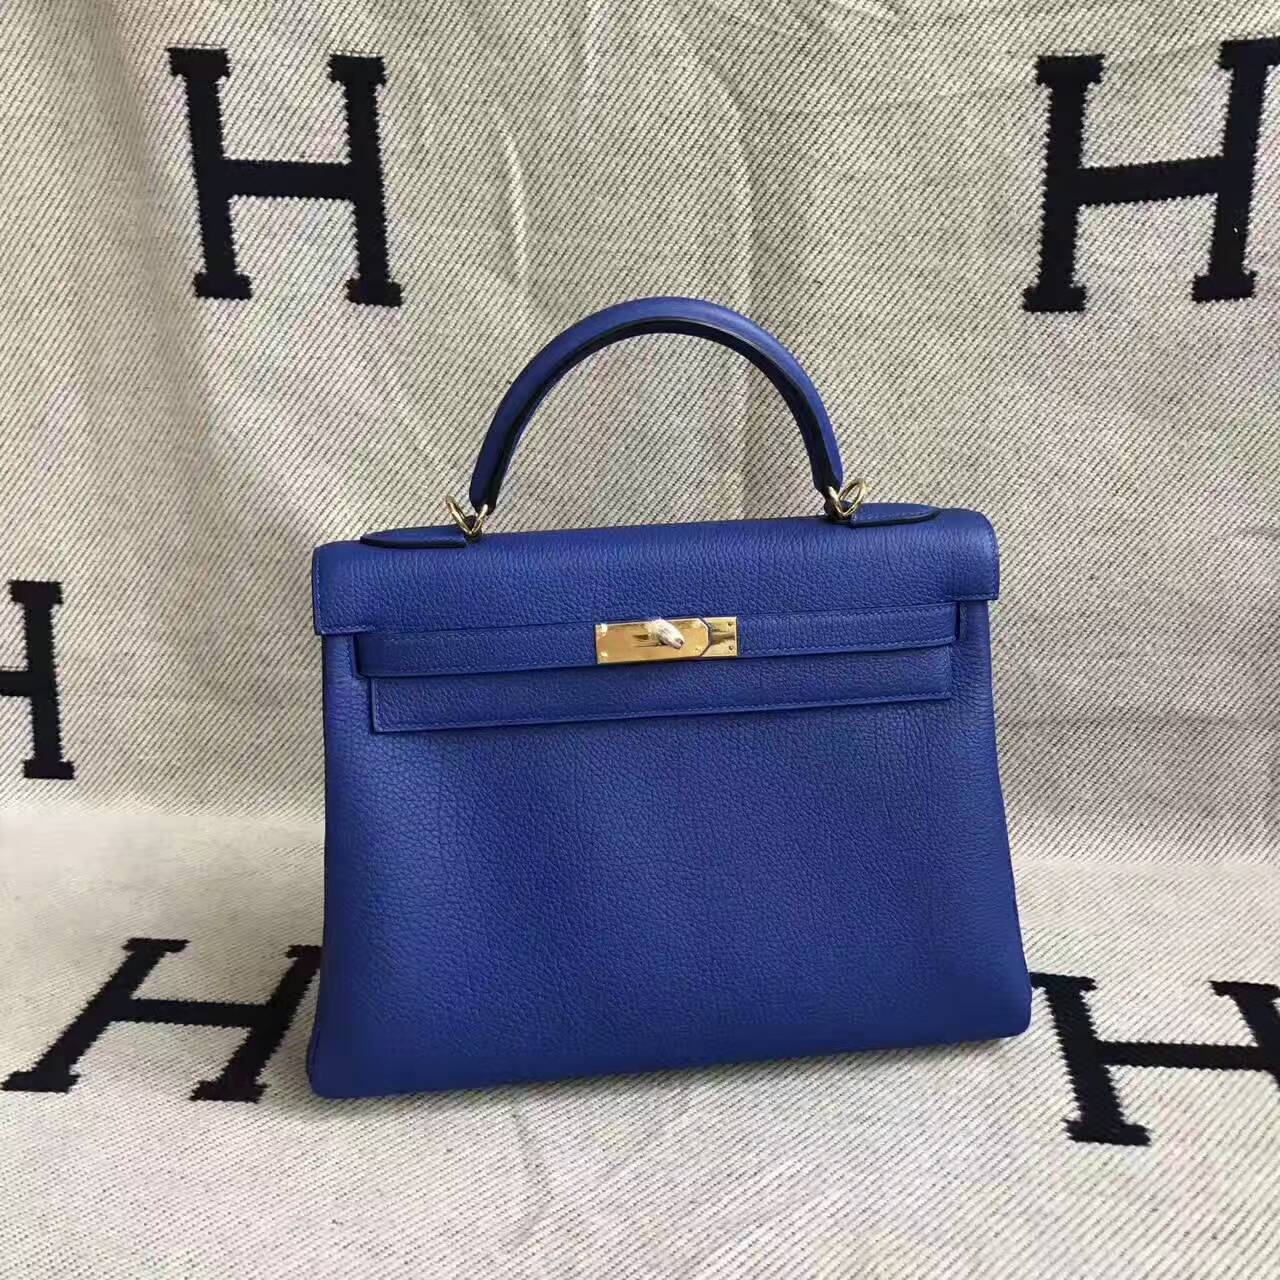 Wholesale Hermes 7T Blue Electric Togo Leather Retourne Kelly32cm Handbag